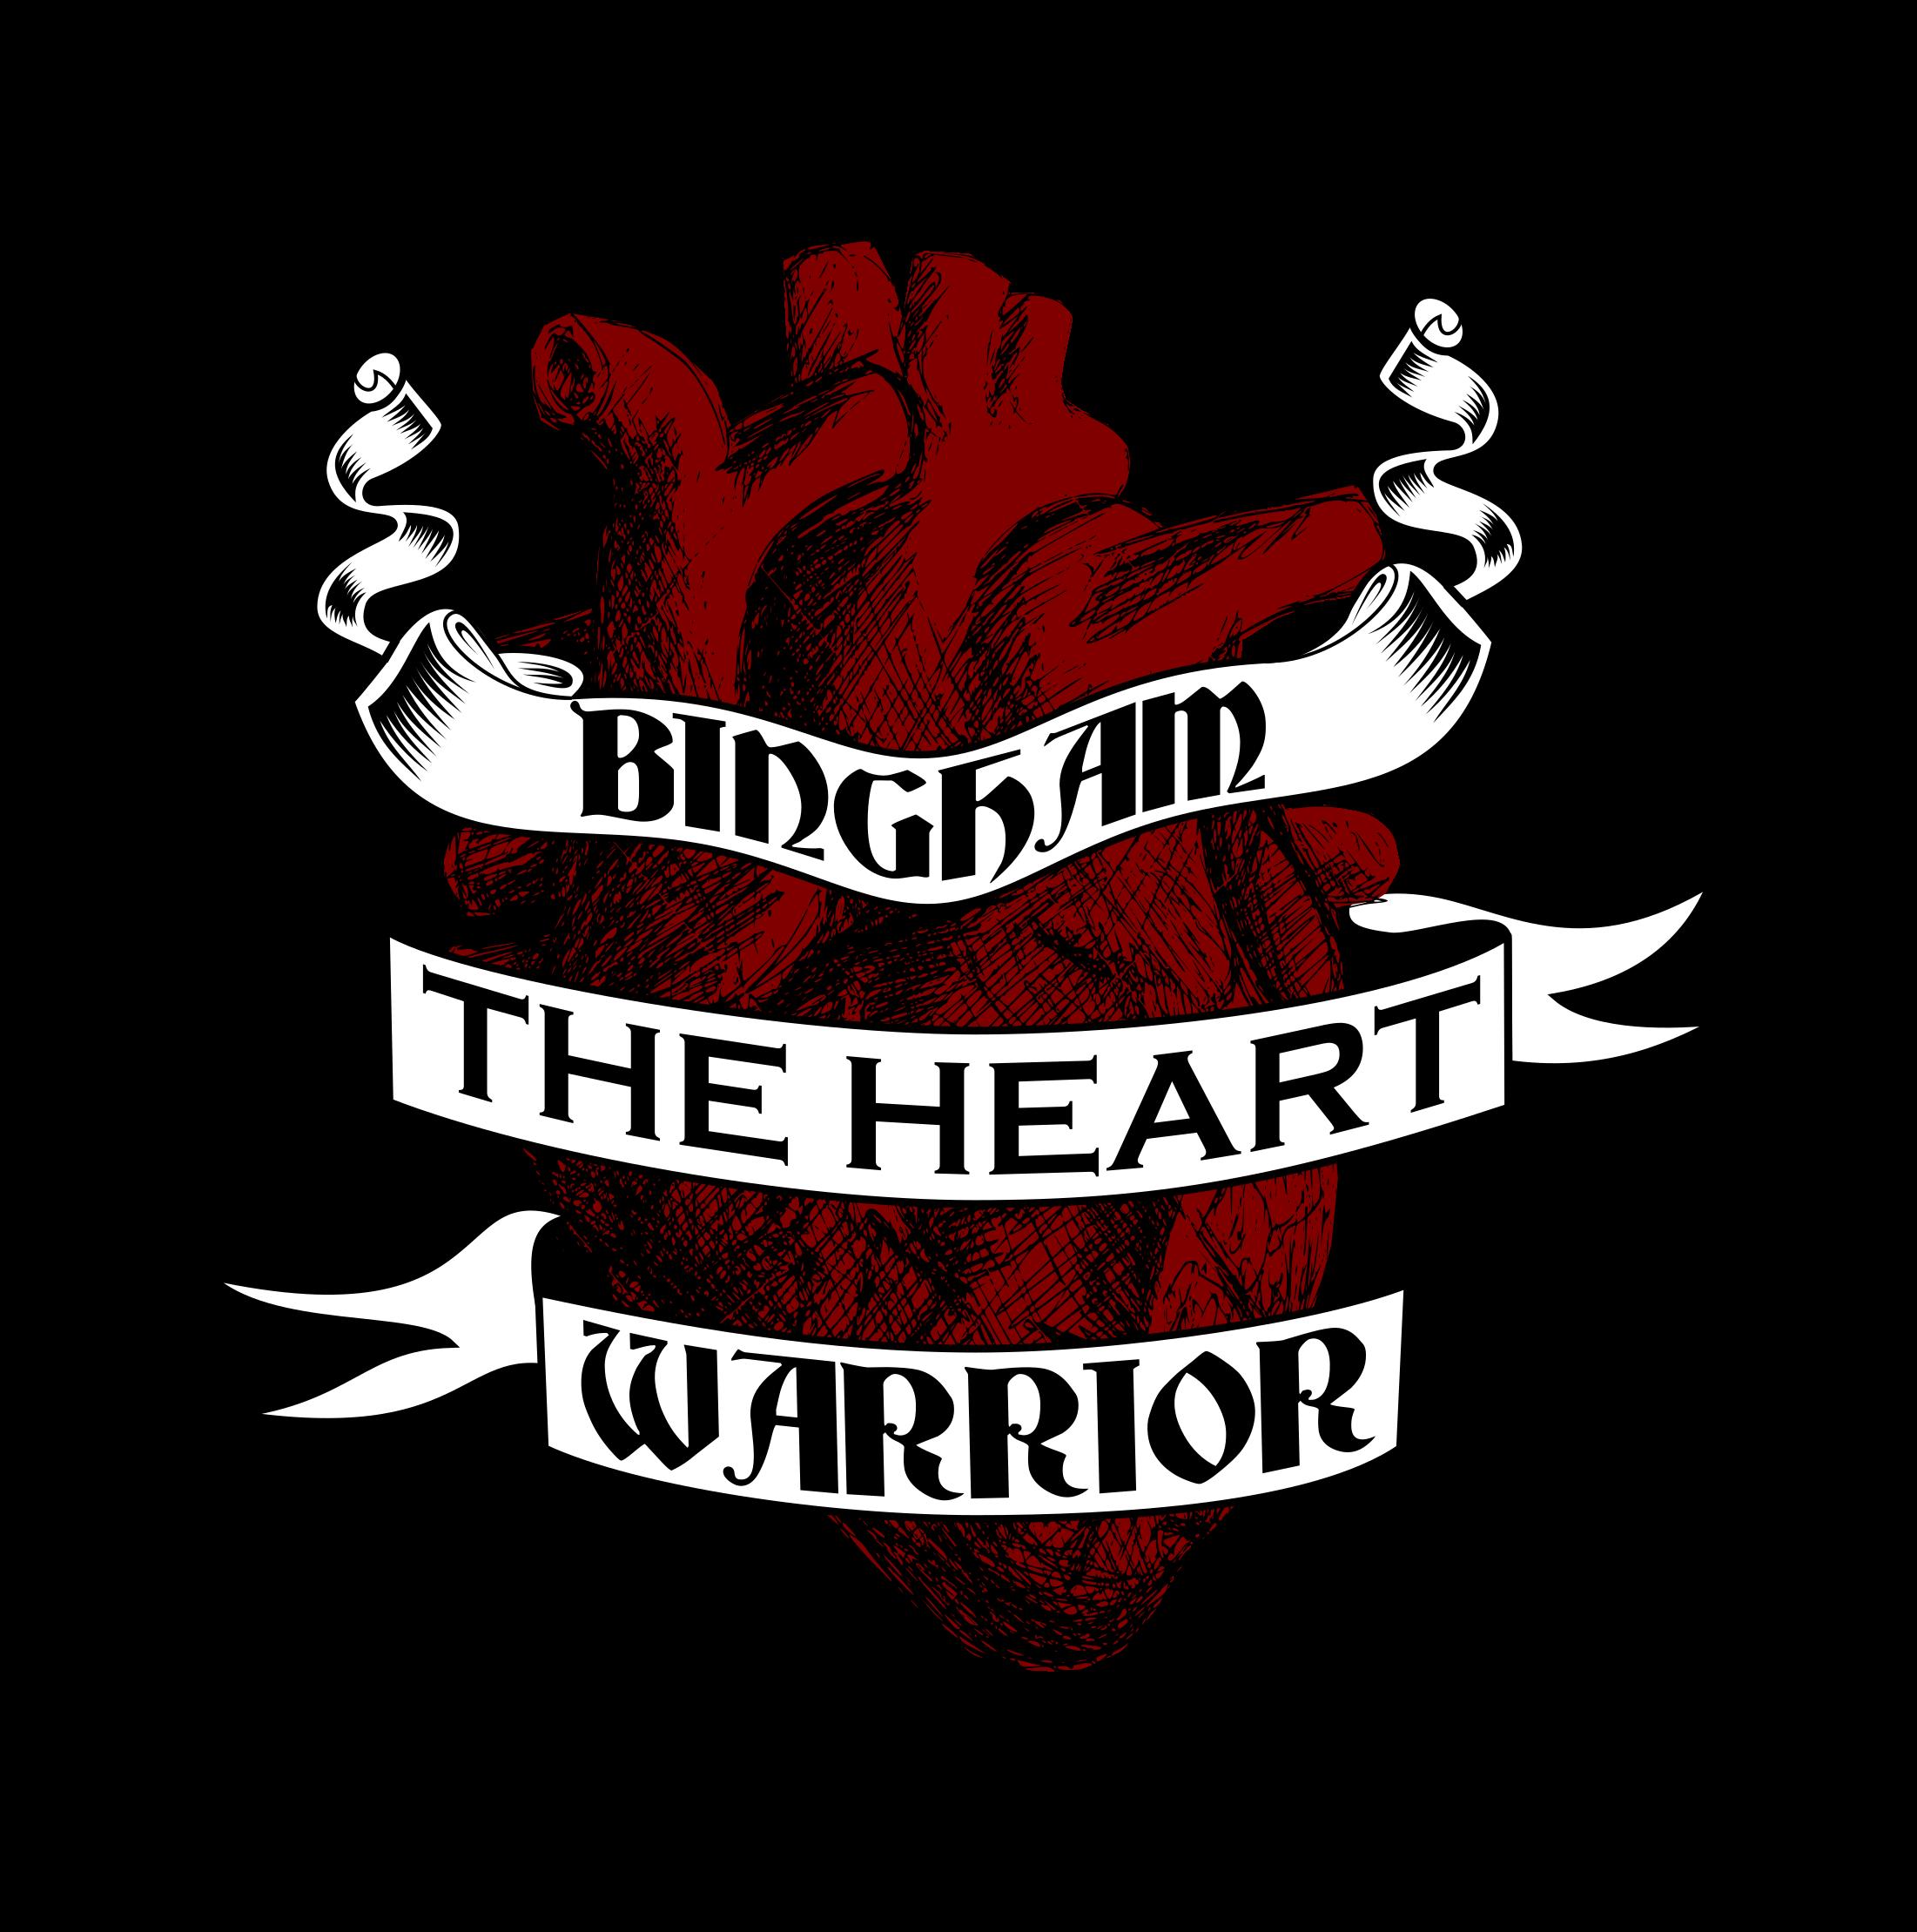 Warrior clipart little warrior. Bingham the heart items